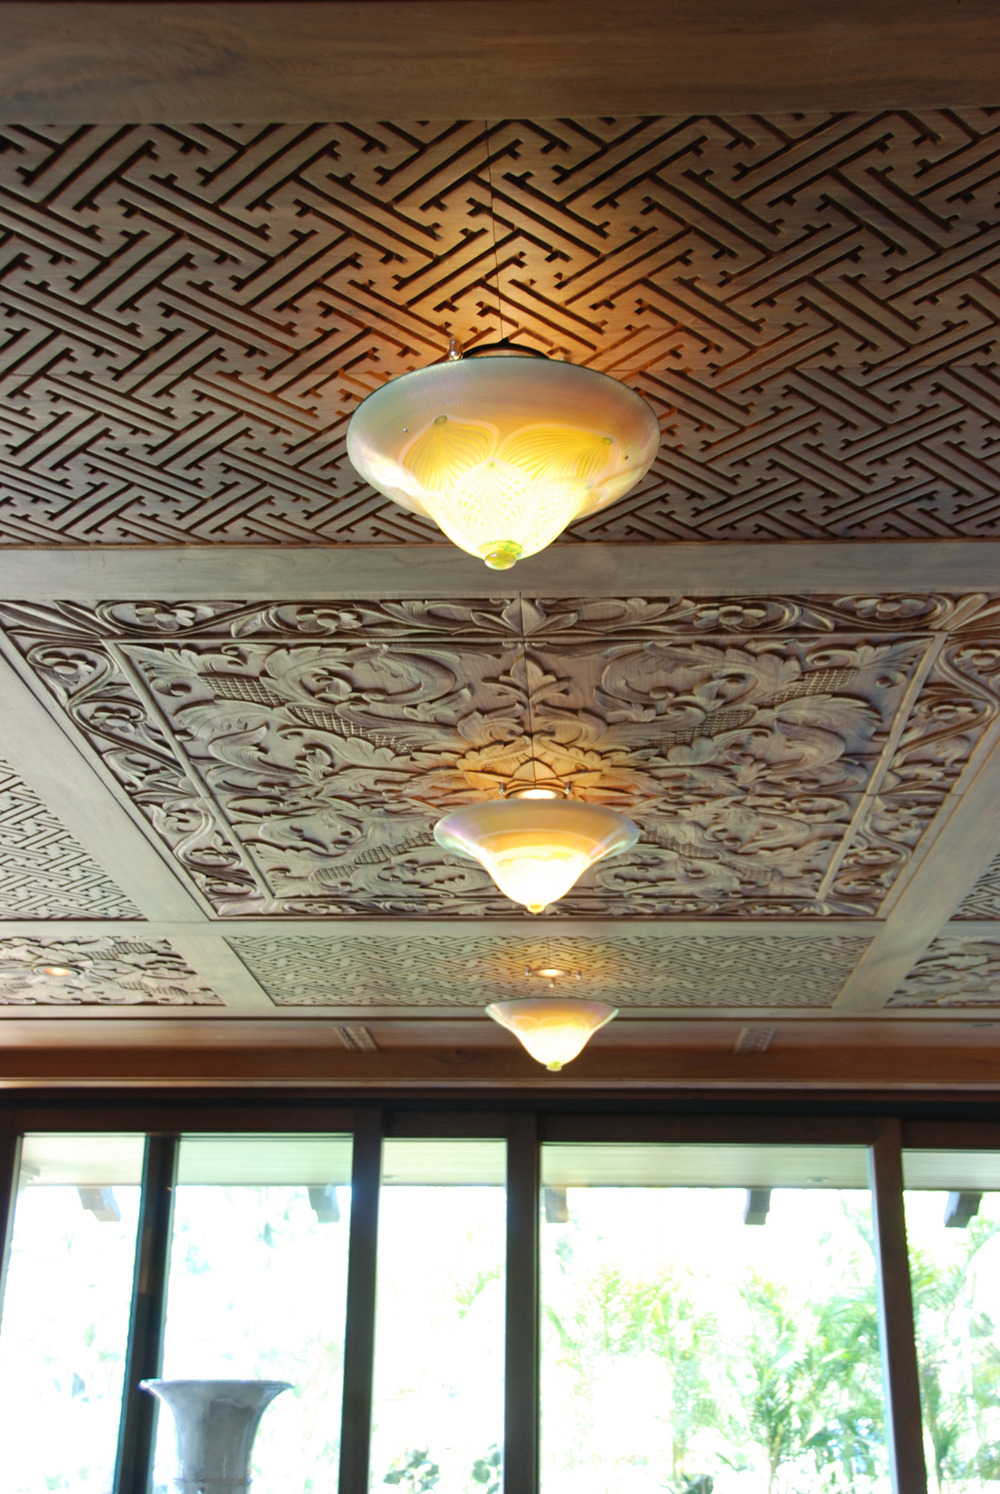 Ceiling ceiling lamp  artist rick strini 1002 copy.JPG